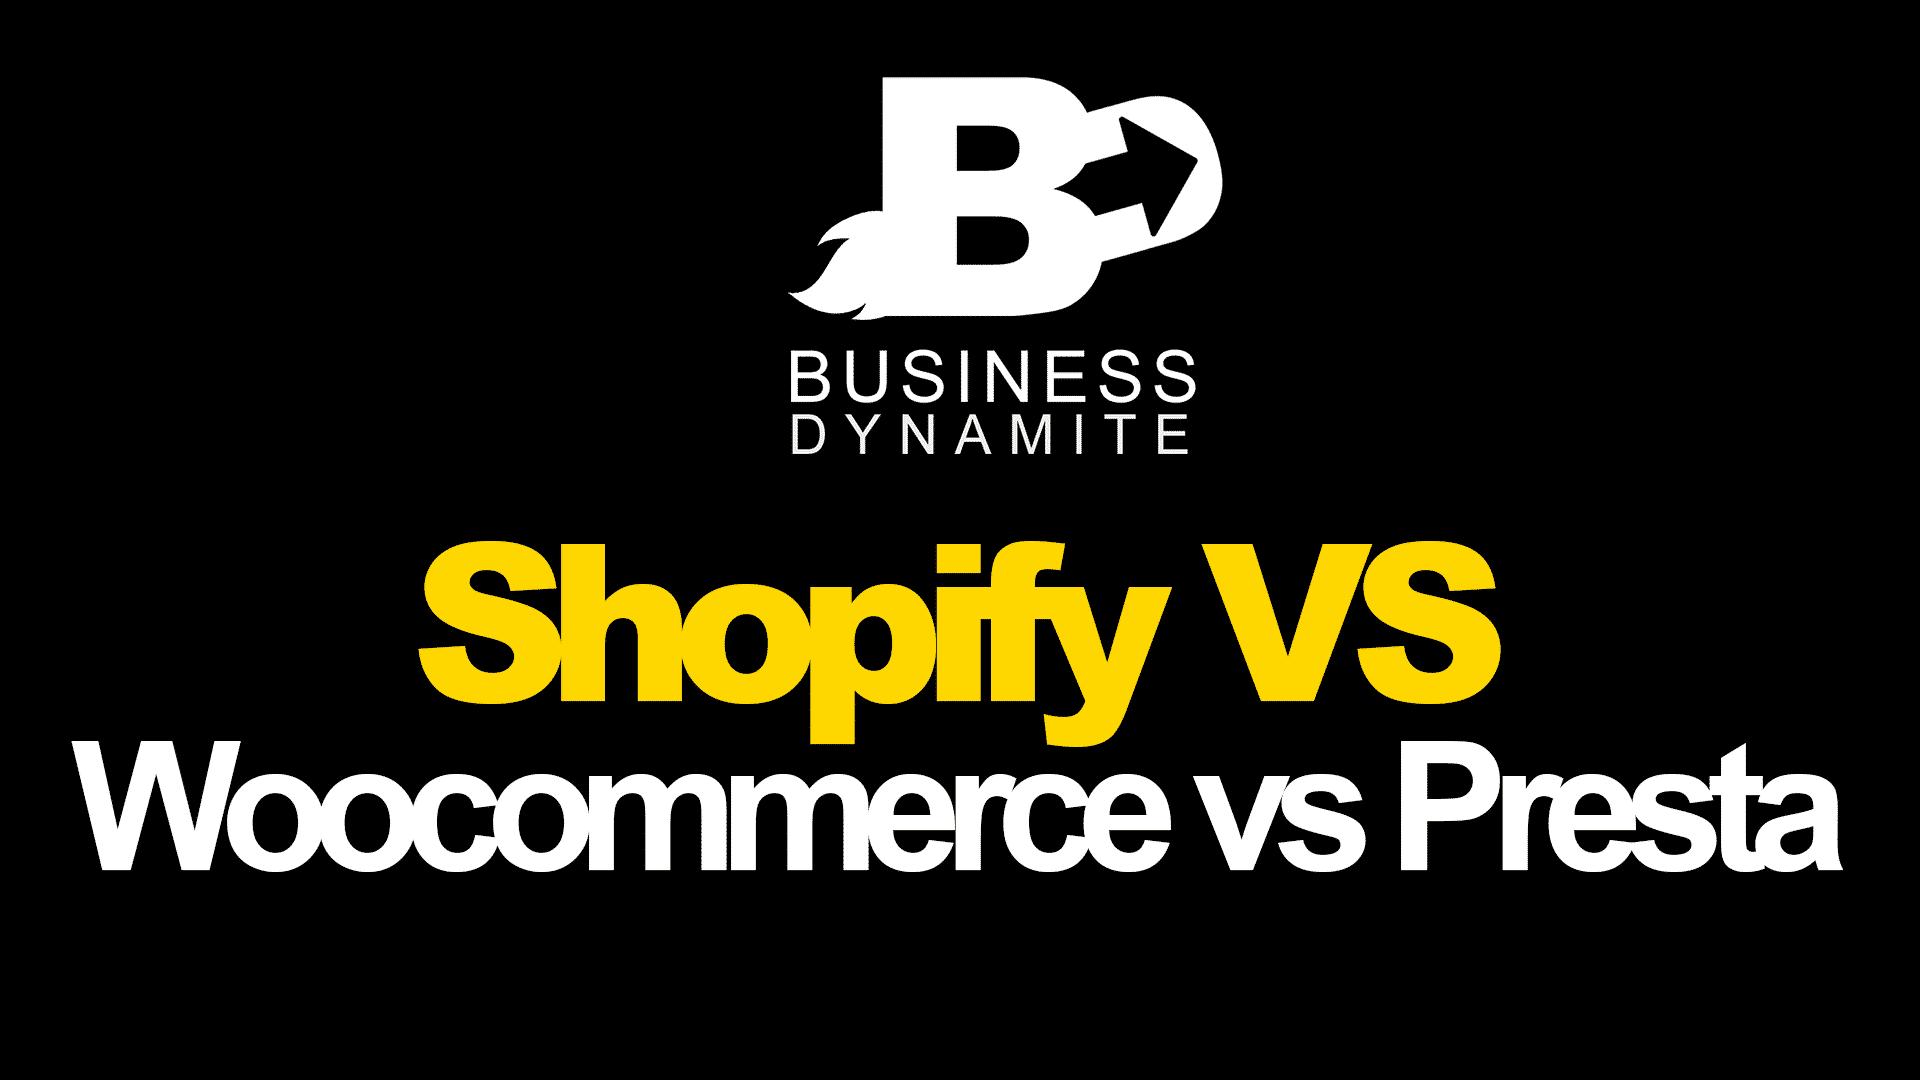 Shopify vs woocommerce vs prestashop en dropshipping 💎